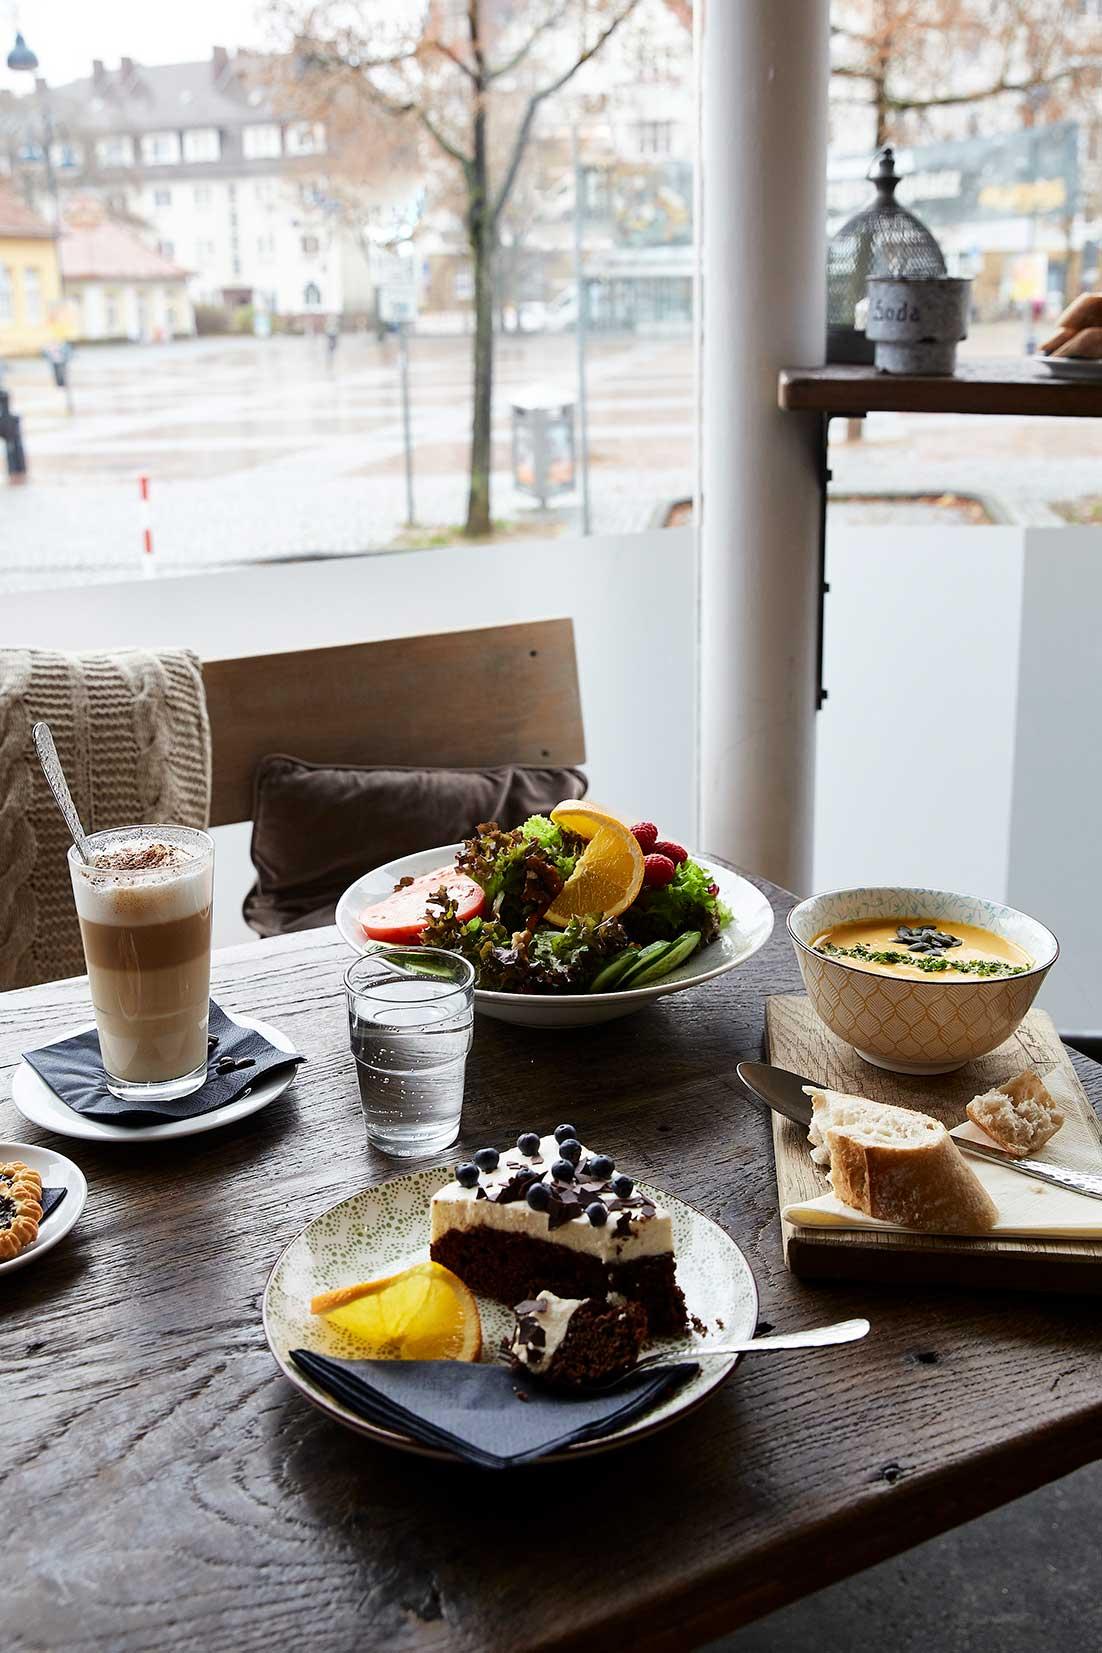 restaurantfotografie-suutje-bielefeld-mittagessen